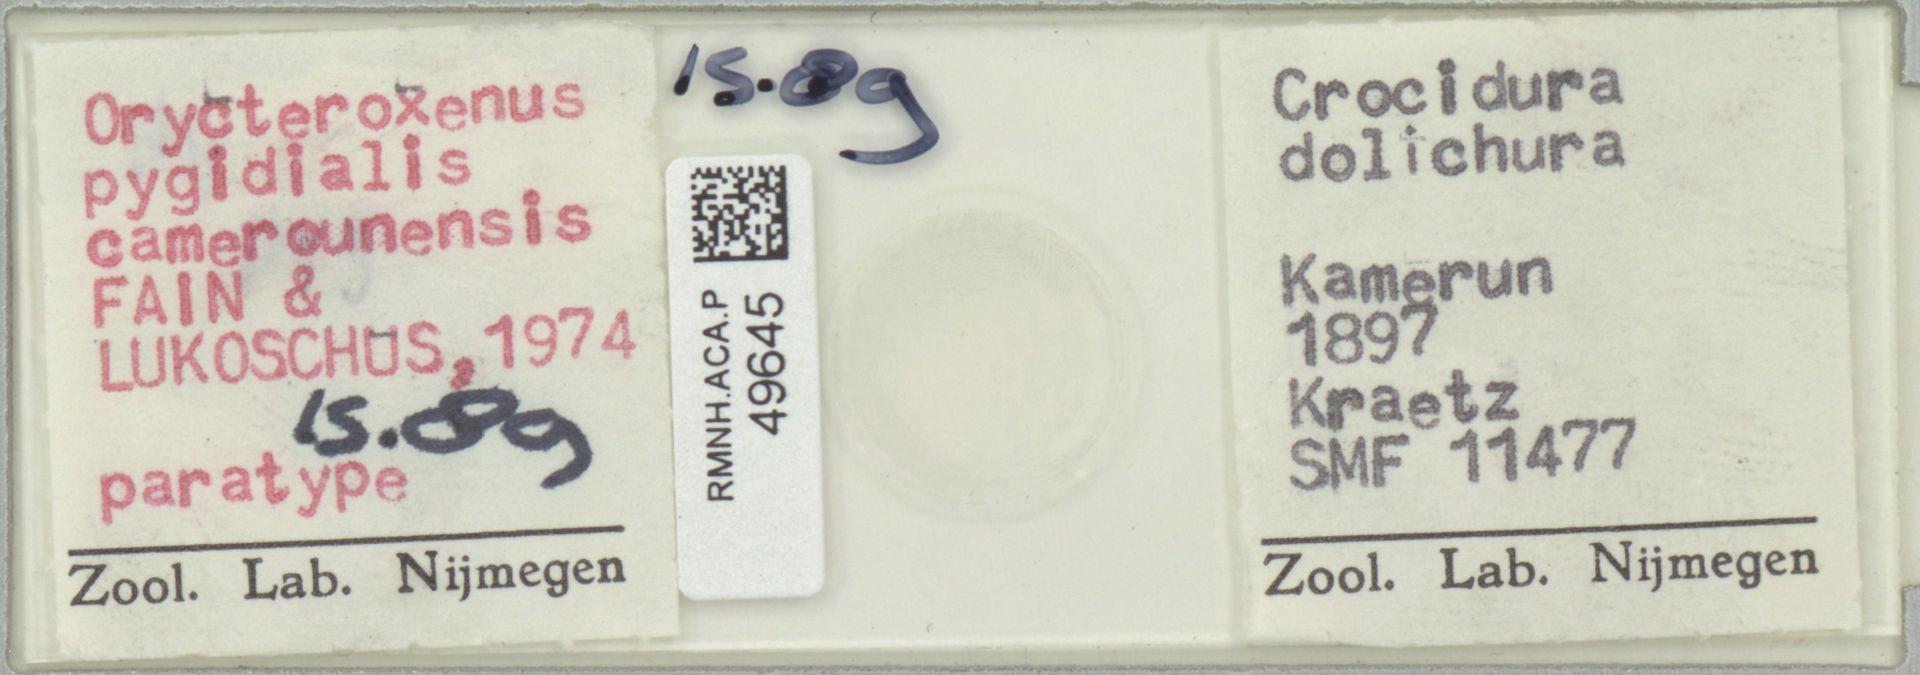 RMNH.ACA.P.49645 | Orycteroxenus pygidialis camerounensis Fain & Lukoschus, 1974